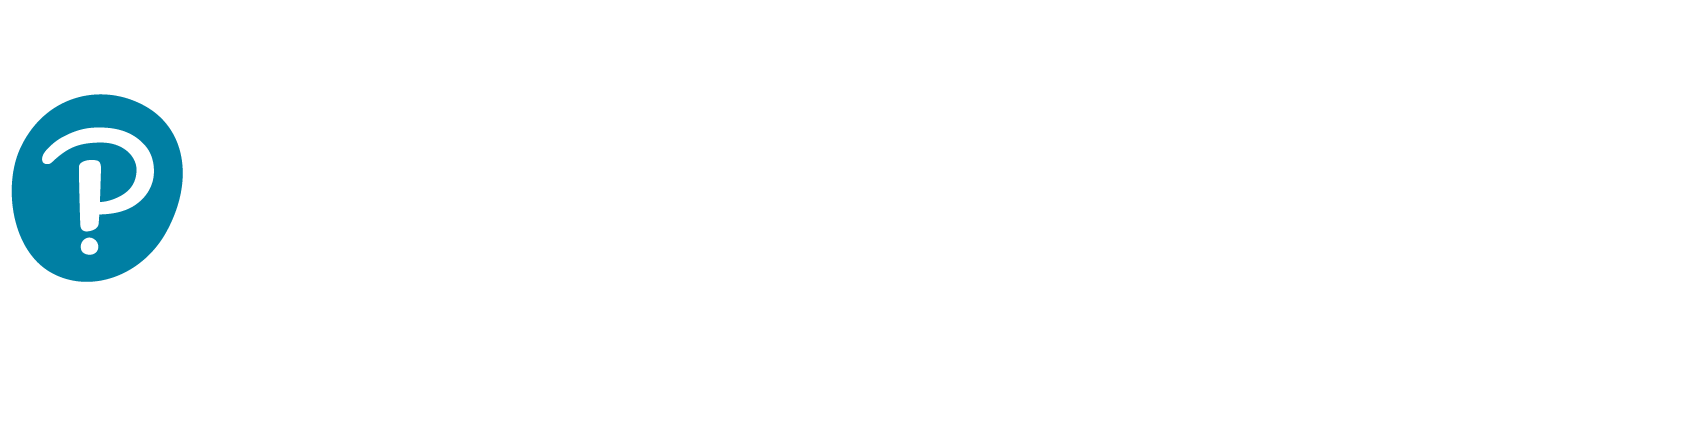 Pearson MyLab Engineering Logo